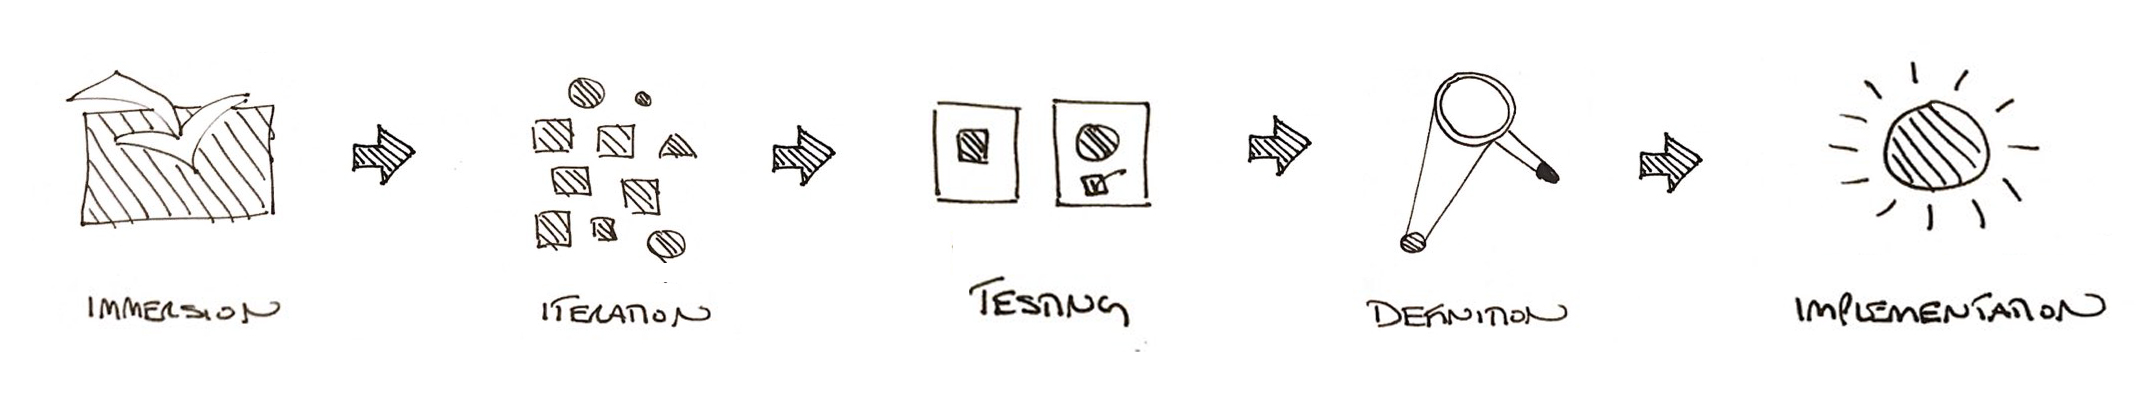 drawn progression.jpg